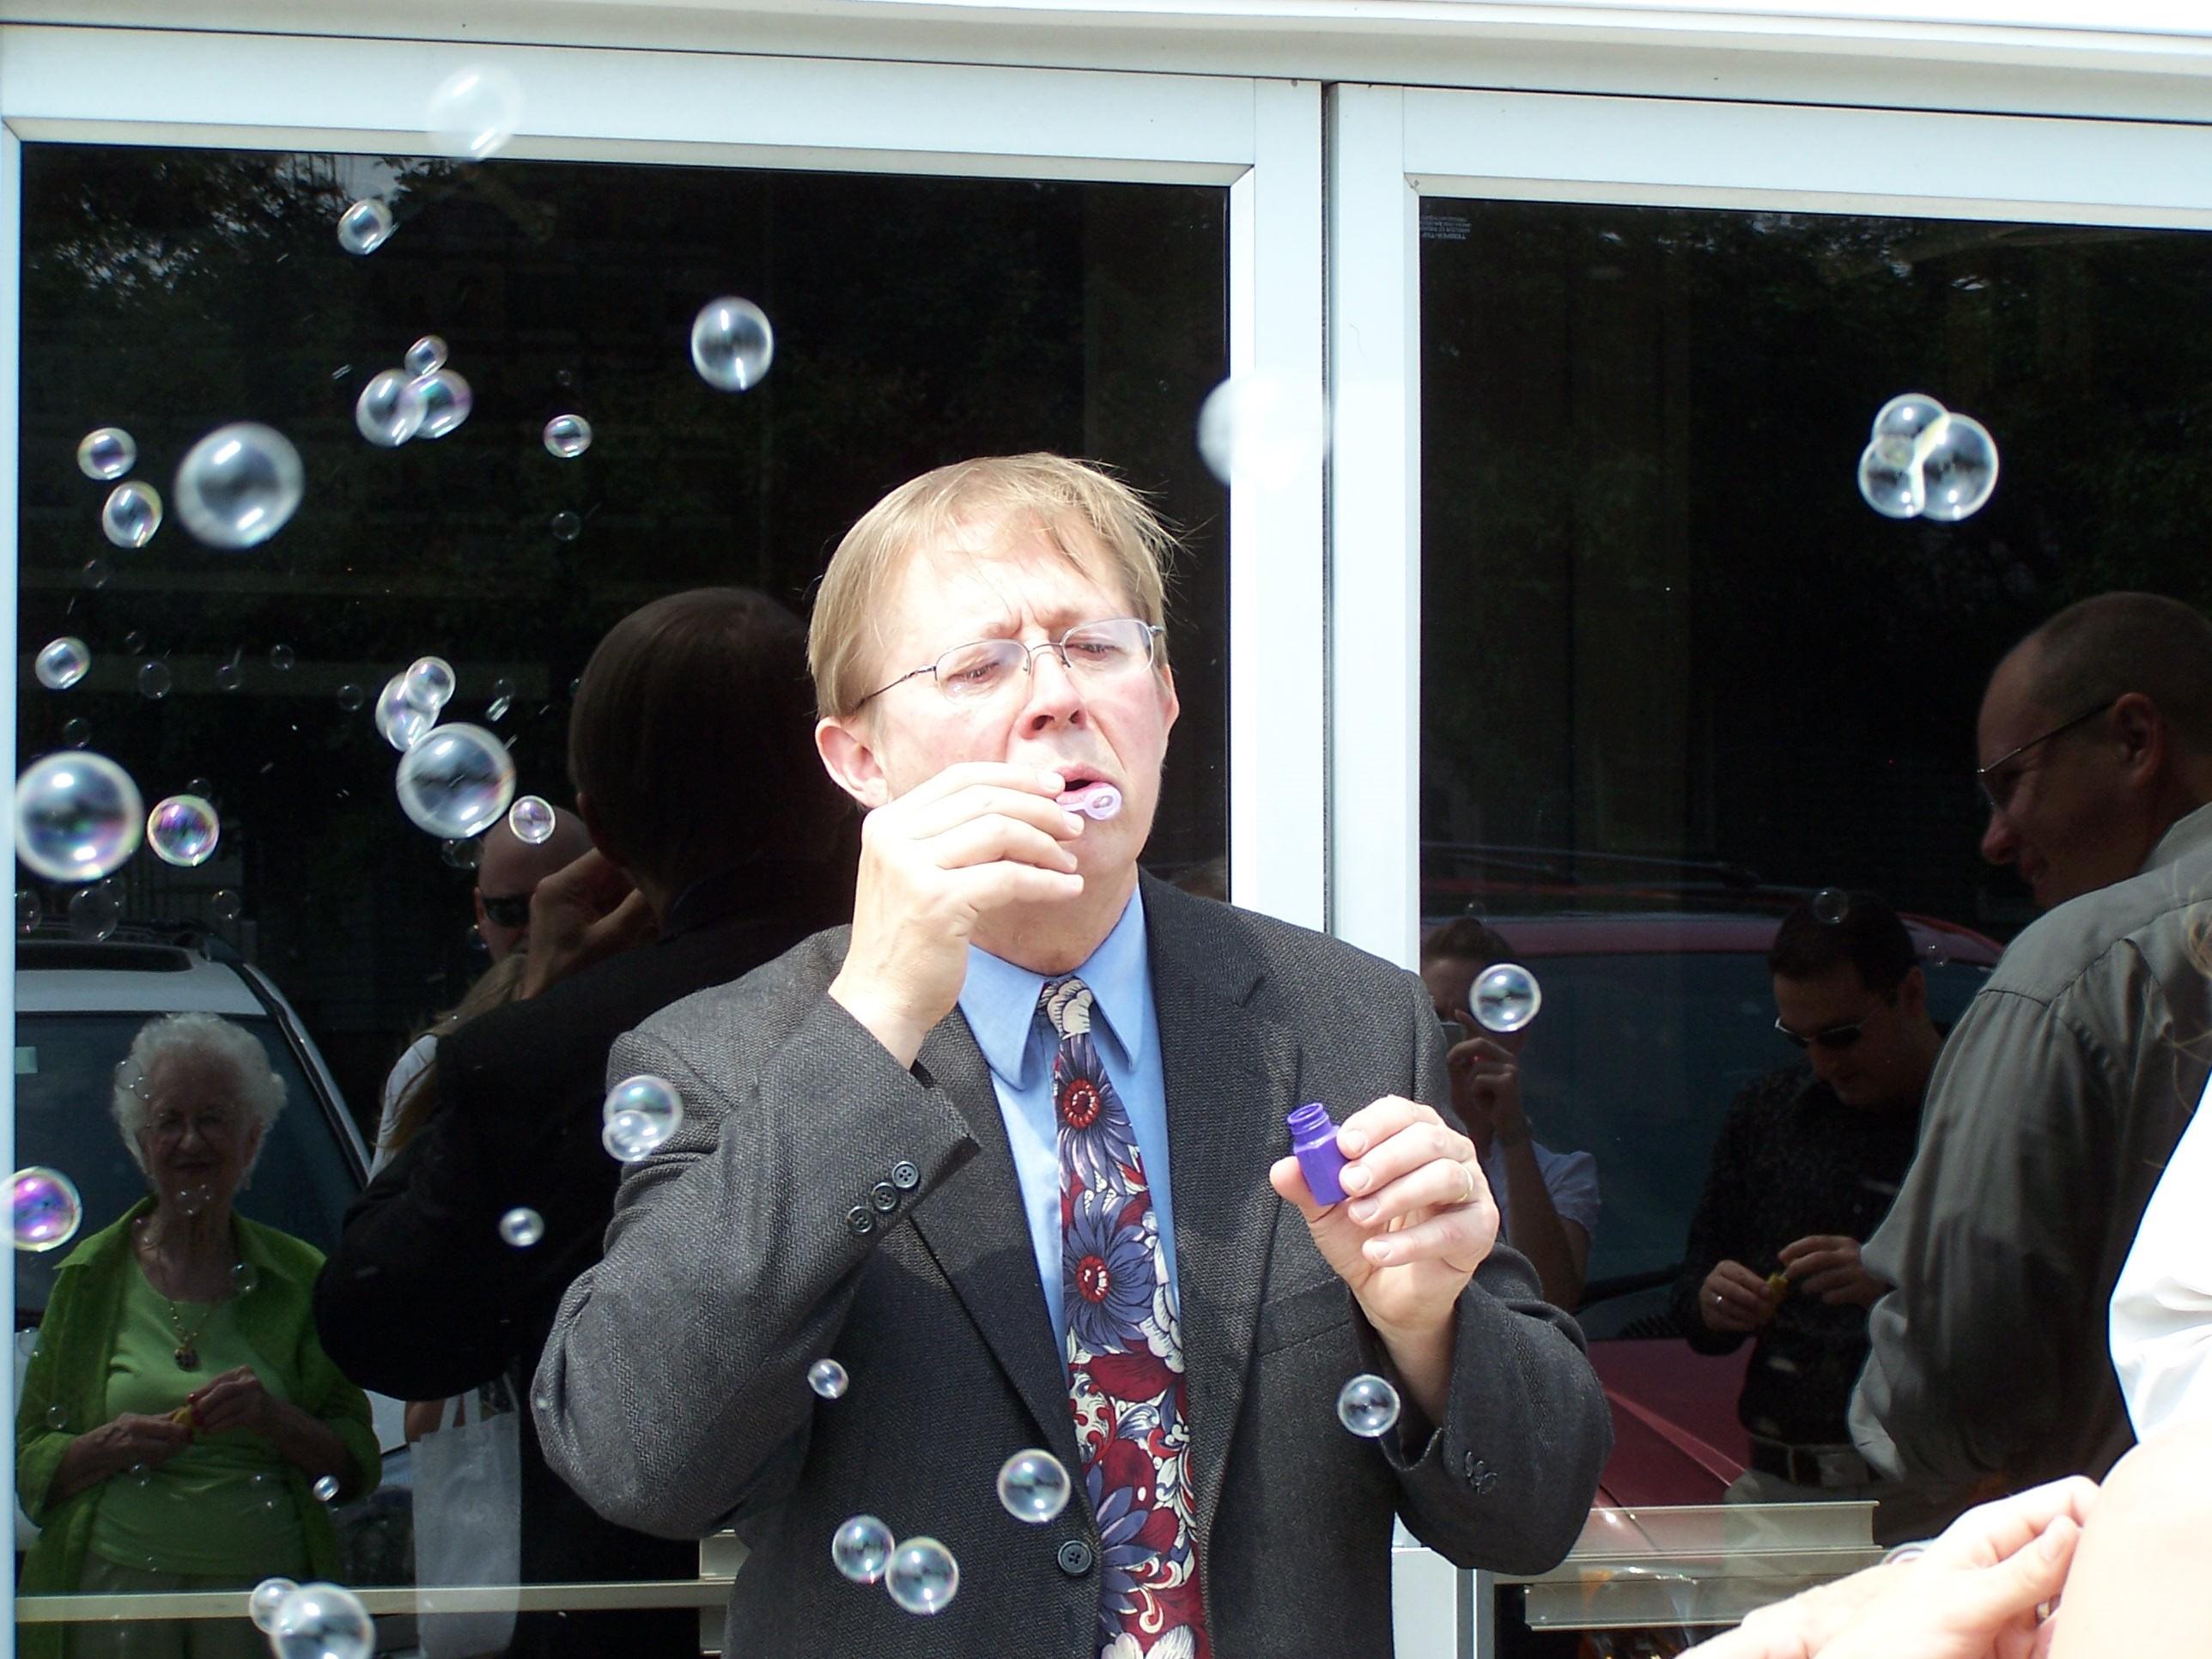 David Maslanka blowing bubbles in Hudson, Illinois on June 7, 2008